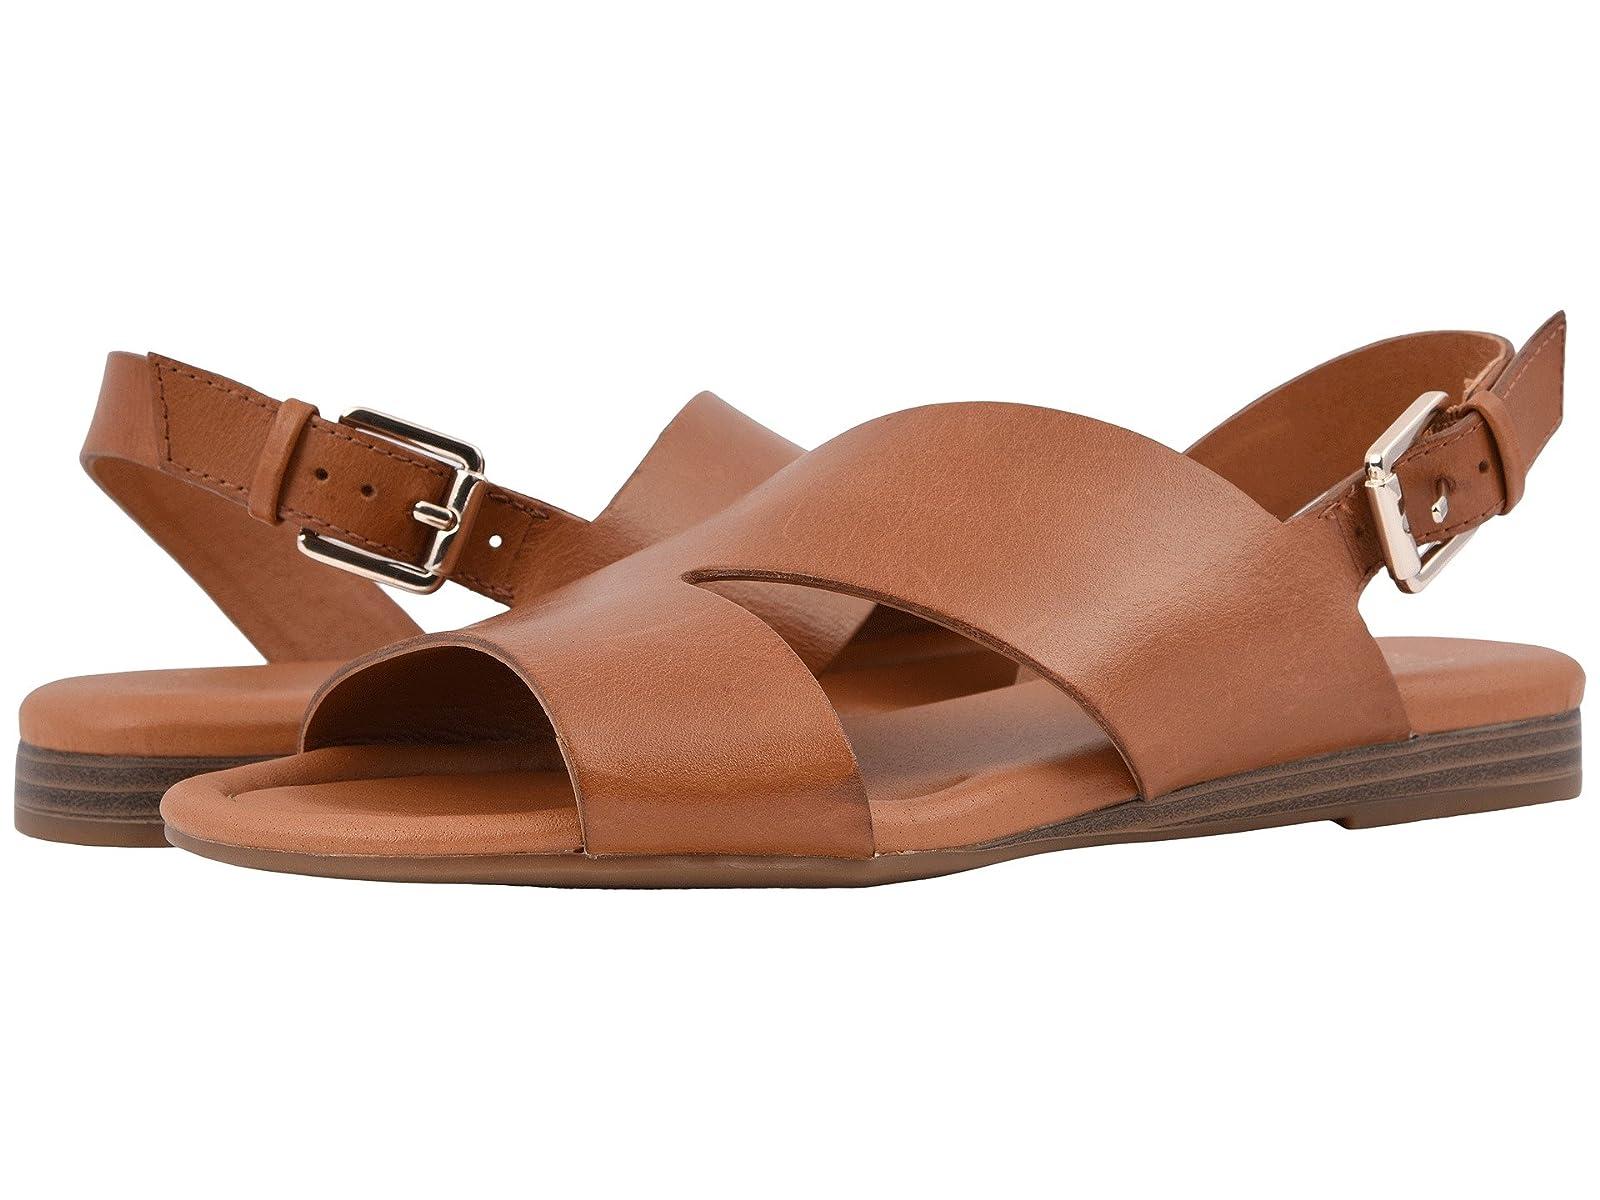 Franco Sarto GarzaAtmospheric grades have affordable shoes